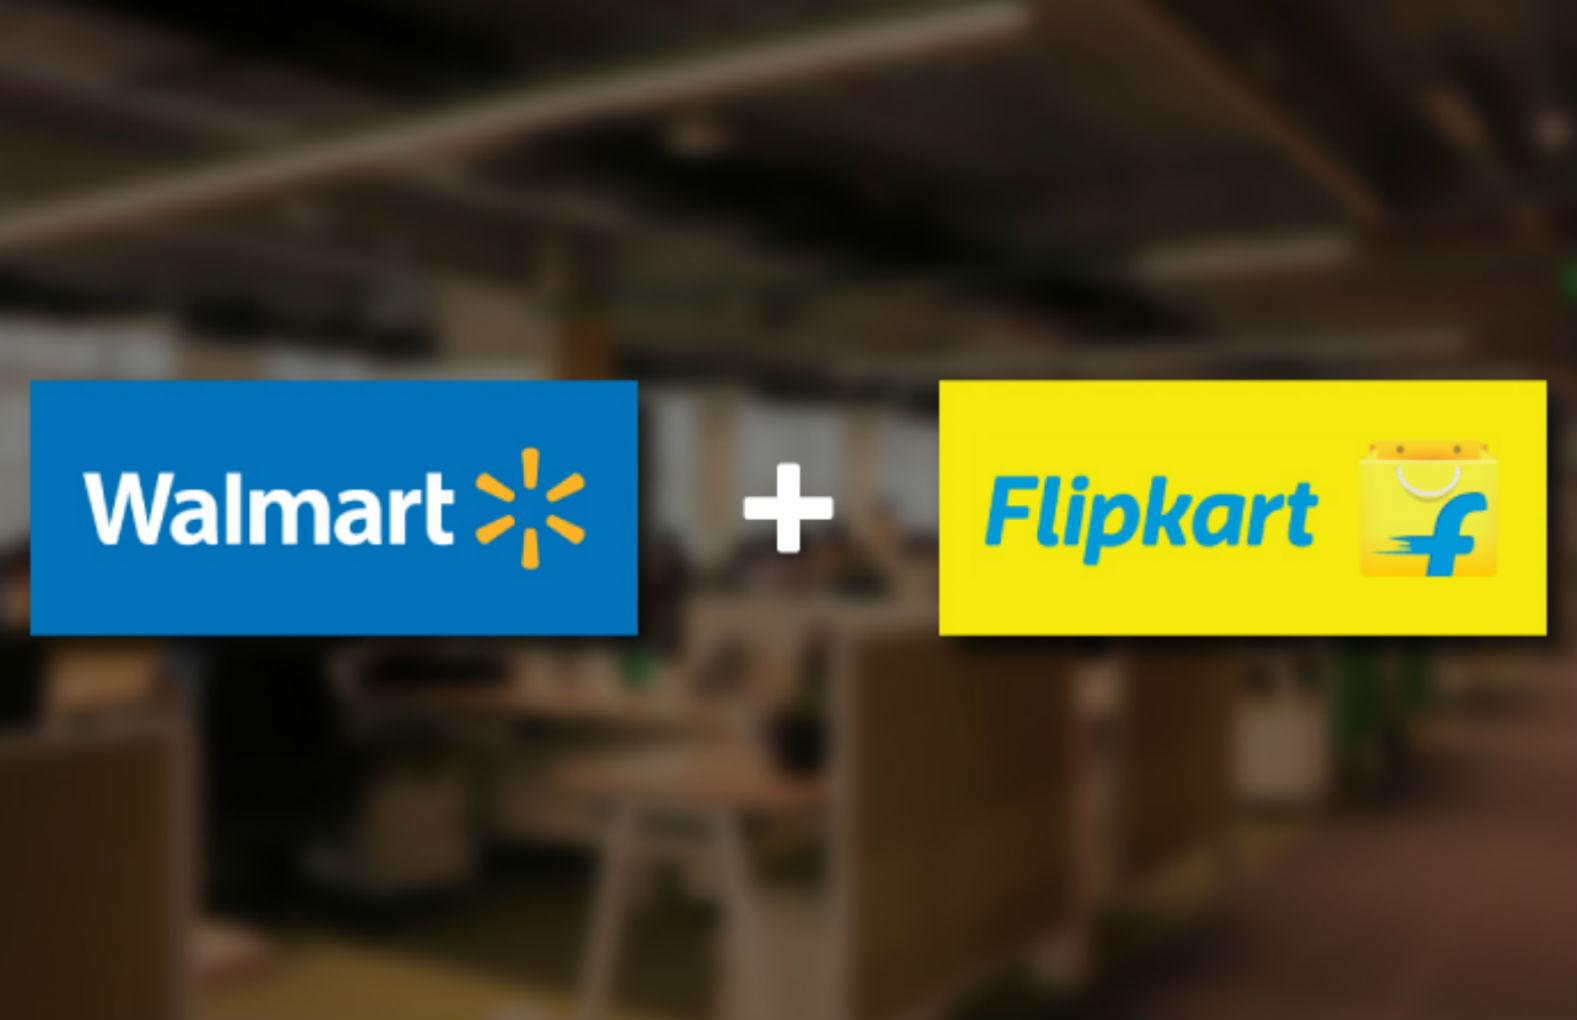 Flipkart Dents Walmart's Profit But Retail Giant Shrugs It Off